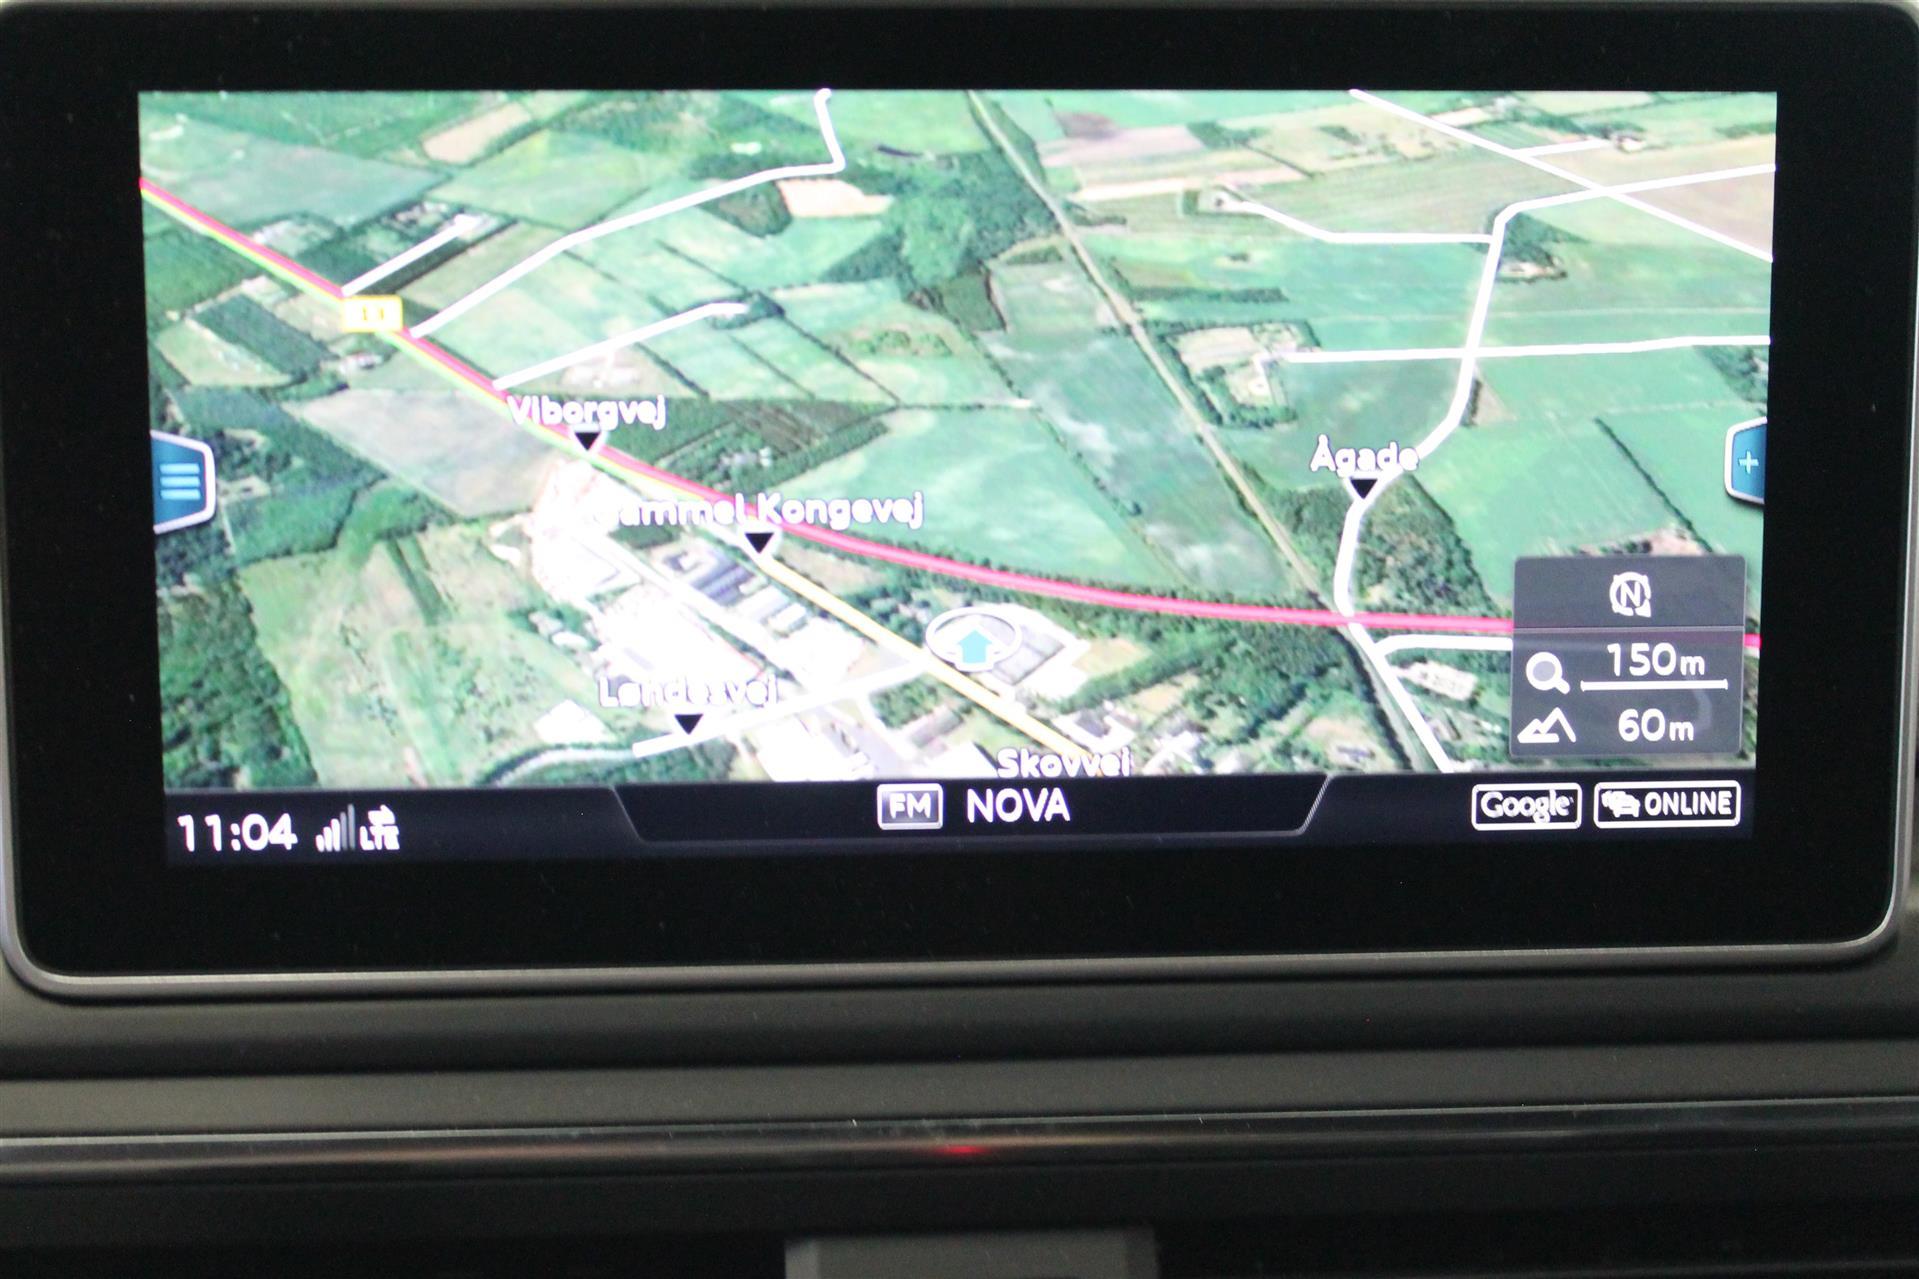 Sportback 3,0 TFSI Quattro Tiptr. 354HK 5d 8g Trinl. Gear image5